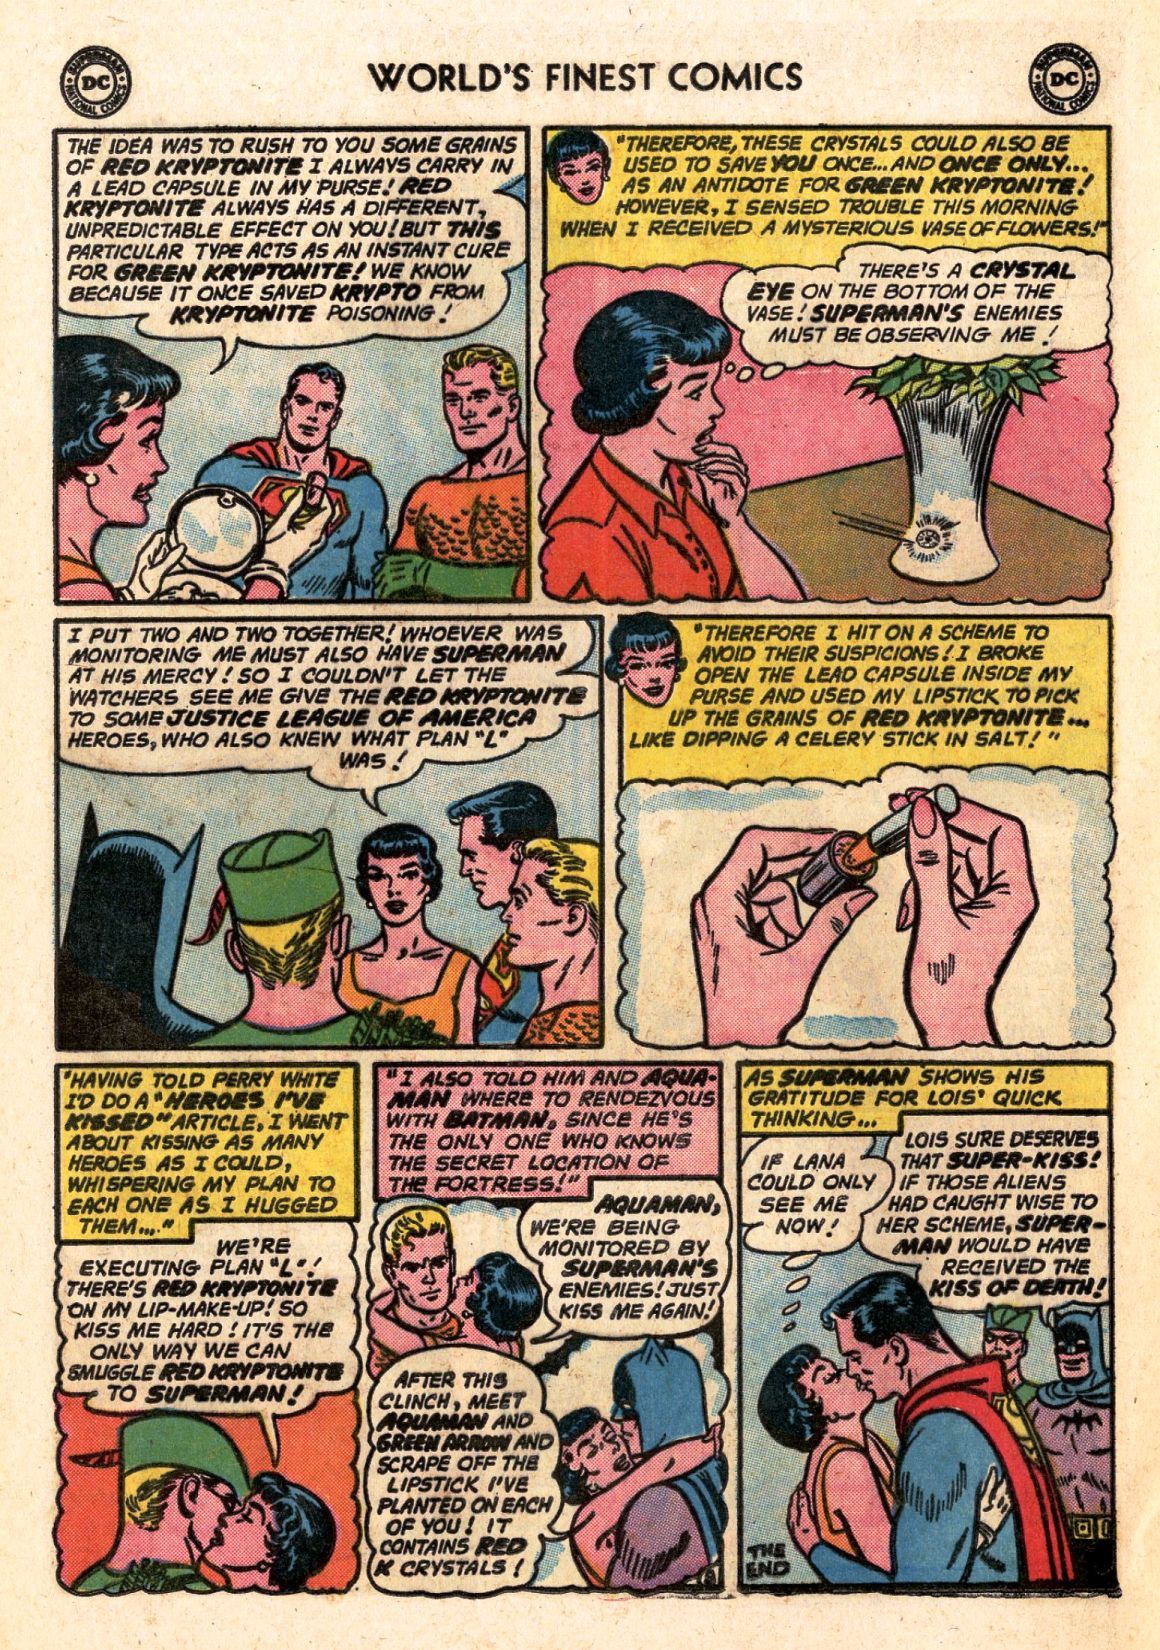 Read online World's Finest Comics comic -  Issue #141 - 32